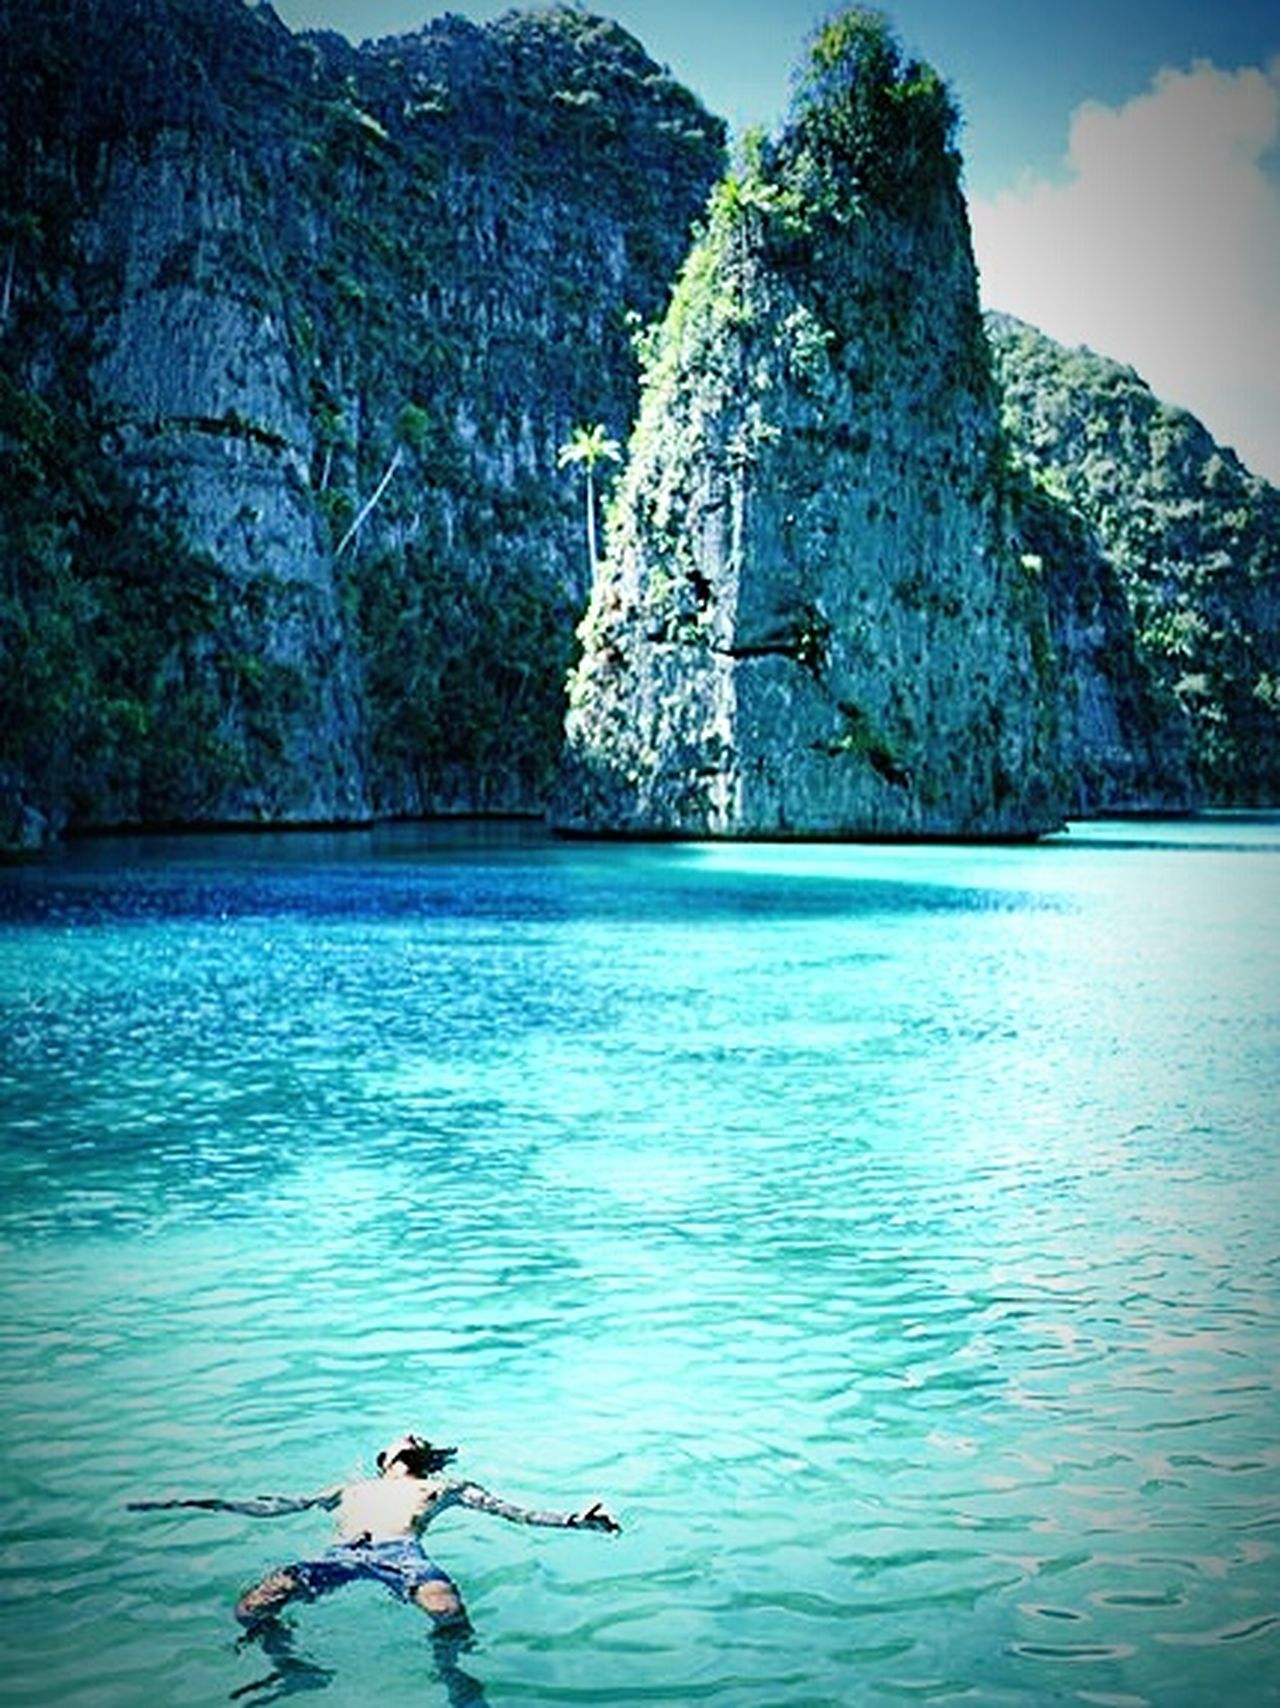 Wow!! @mytripmyadvntr First Eyeem Photo location: Indonesia.Raja ampat Pesonaindonesia